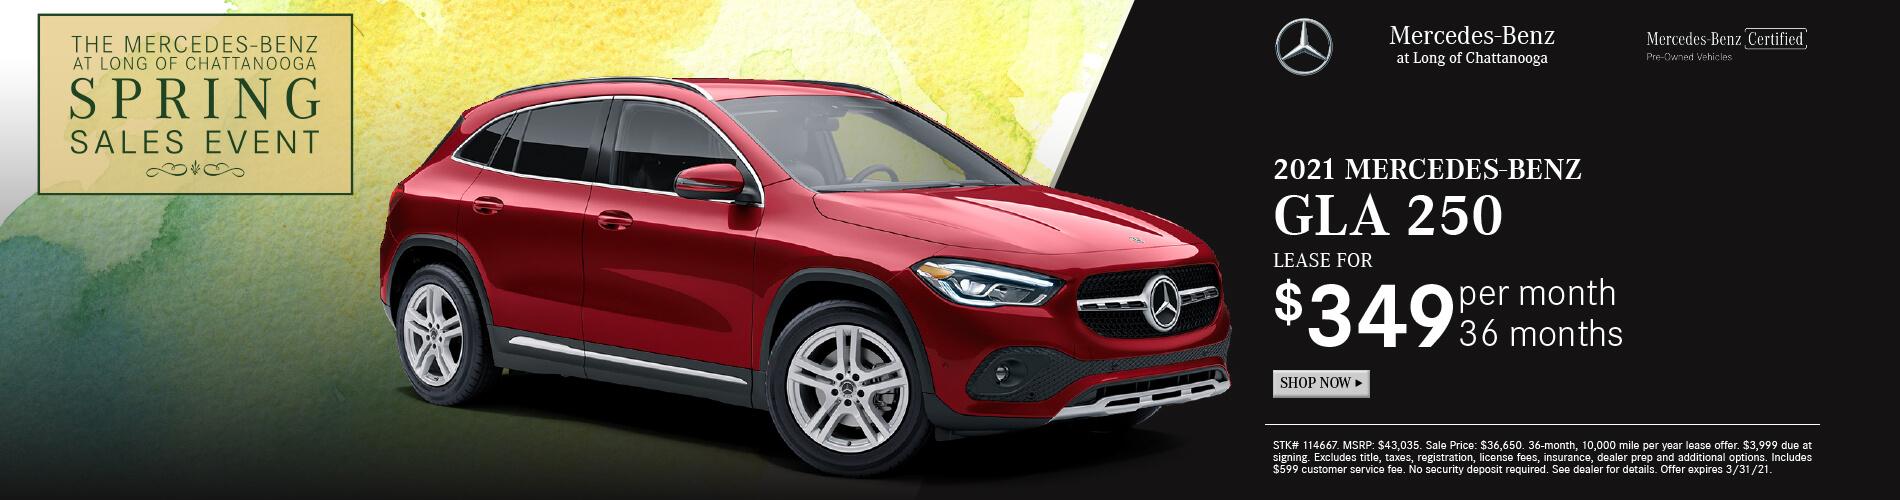 Mercedes-Benz Fresh Start Sales Event in Chattanooga